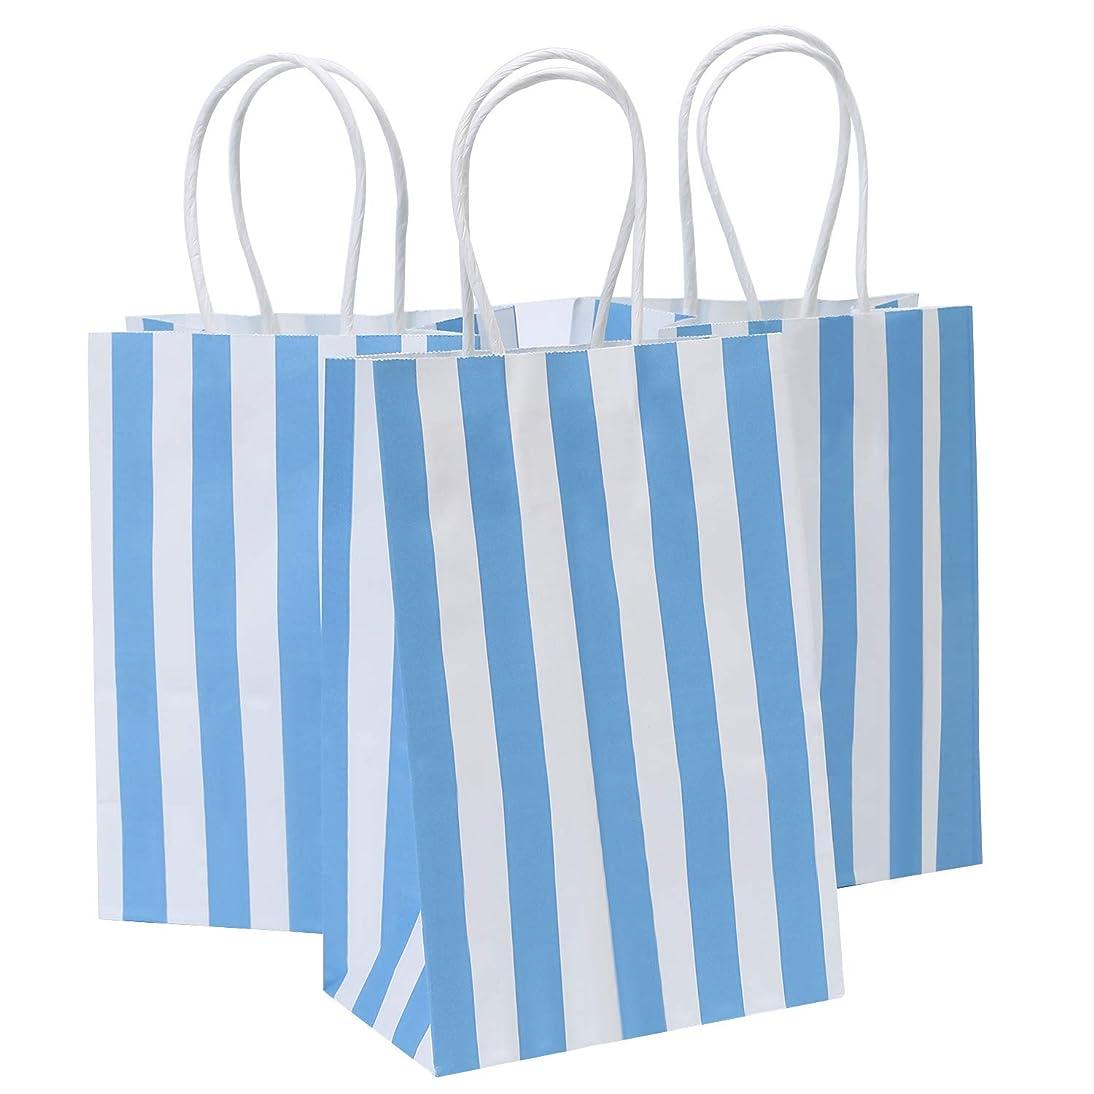 Road 5.25x3.25x8 Inches 50pcs Blue Stripes Kraft Paper Bags, Small Shopping Bag, Retail bag, Craft Paper Bag, Gift Bag